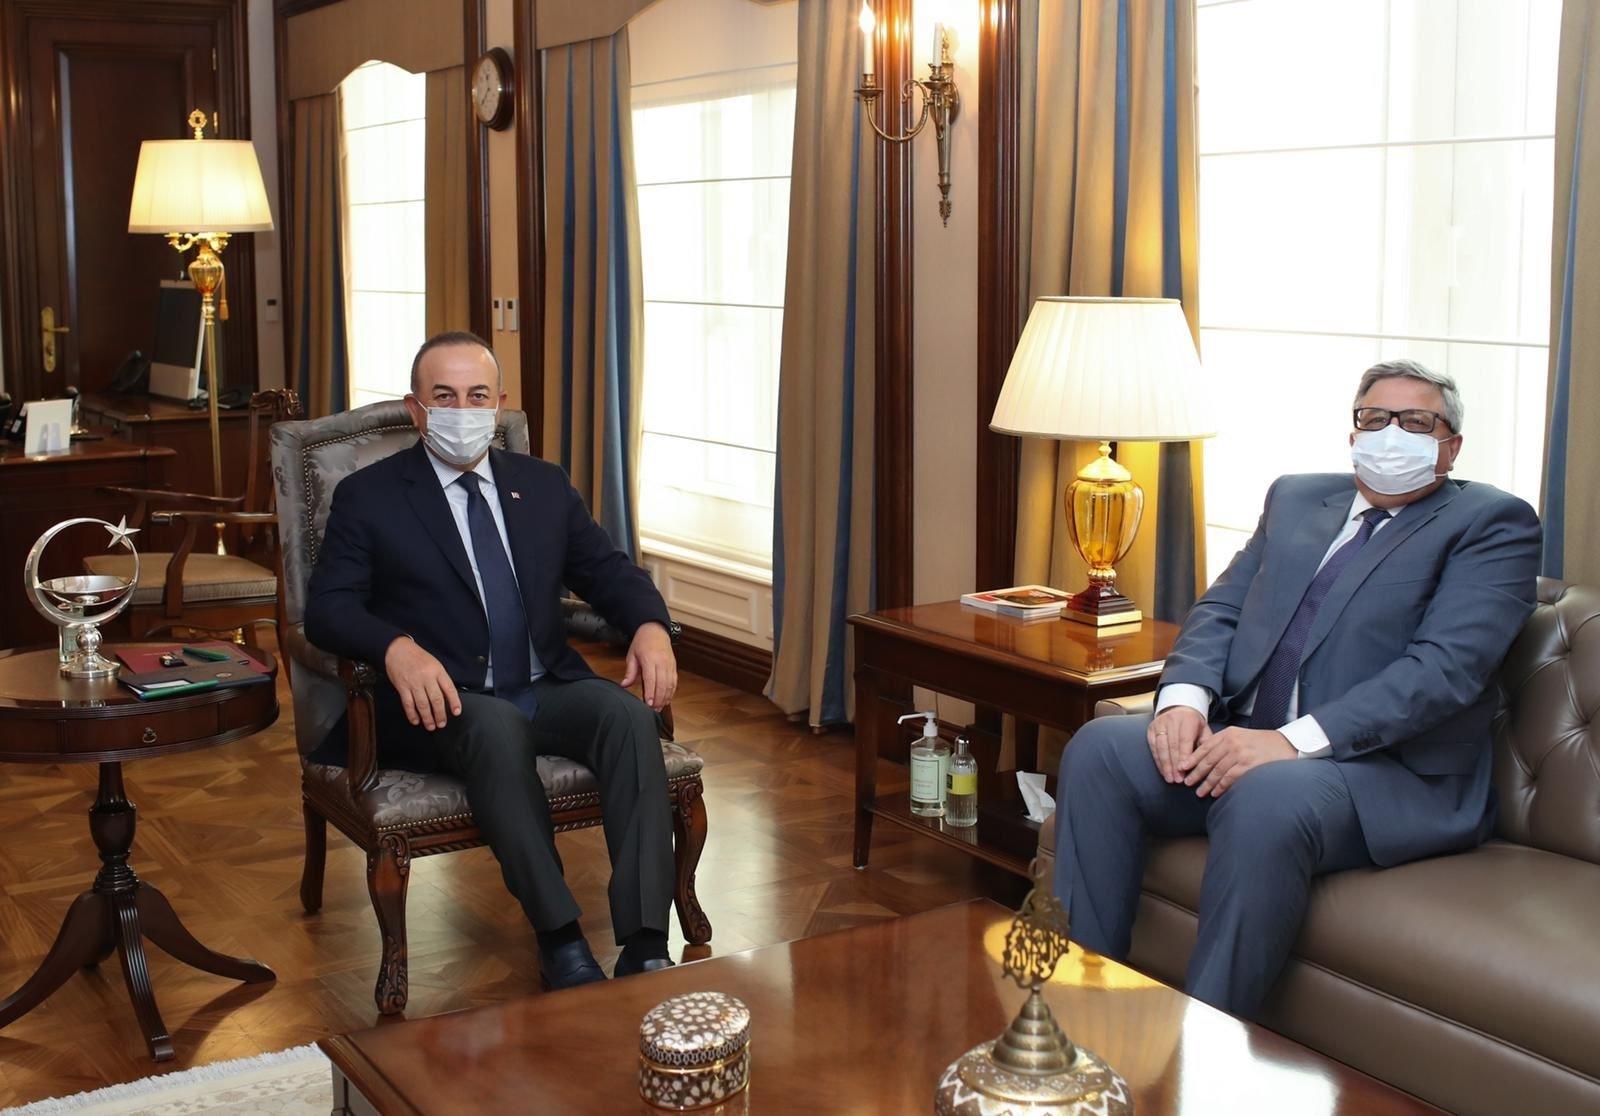 Foreign Minister Mevlüt Çavuşoğlu (L) with Russian Ambassador Aleksei Erkhov in Ankara, Turkey, April 19, 2021. (DHA Photo)